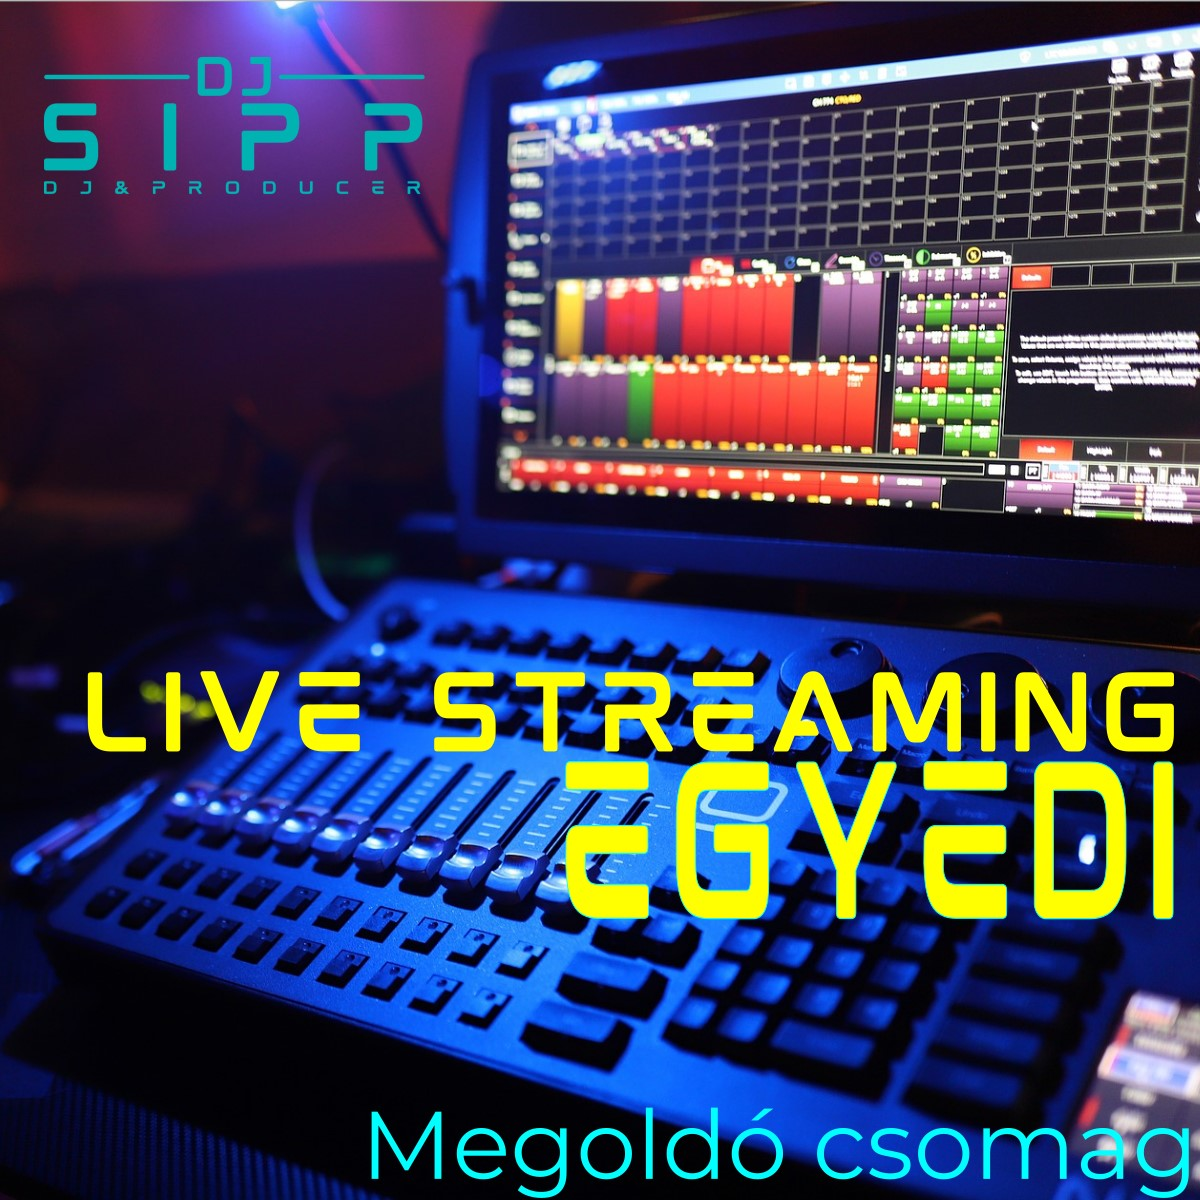 Live Streaming - Egyedi